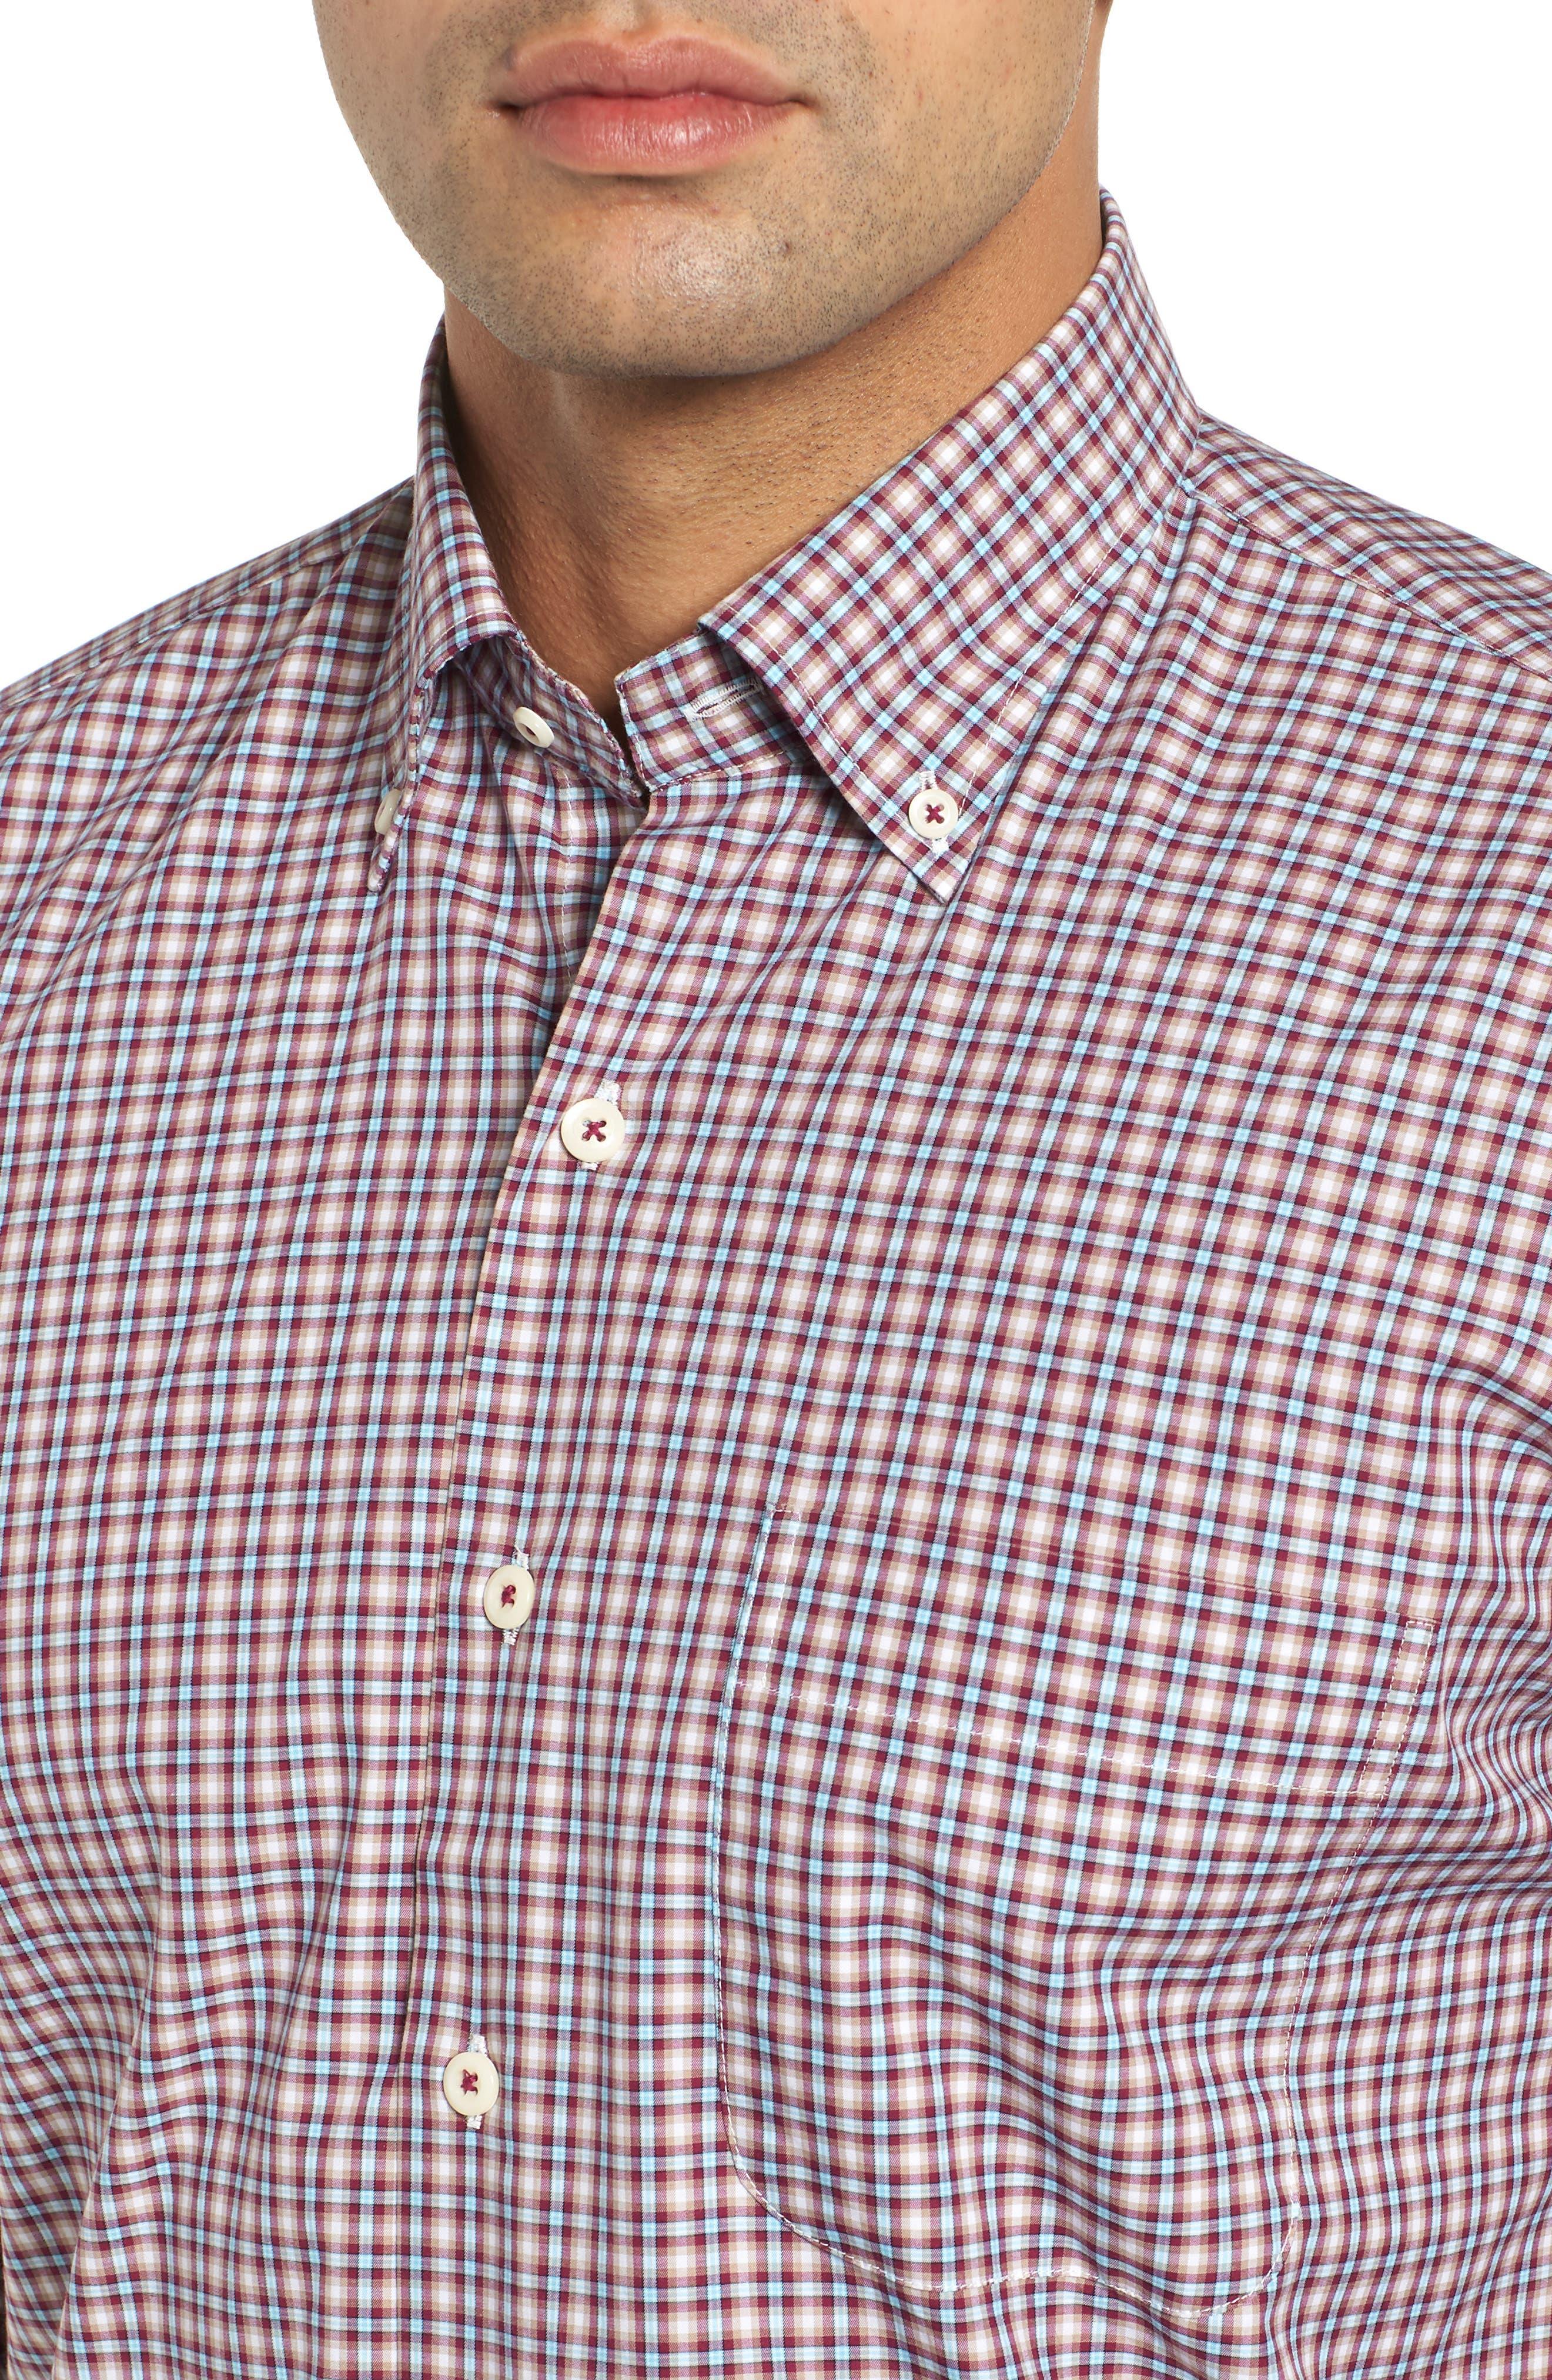 Albertville Check Sport Shirt,                             Alternate thumbnail 2, color,                             WINTERBERRY